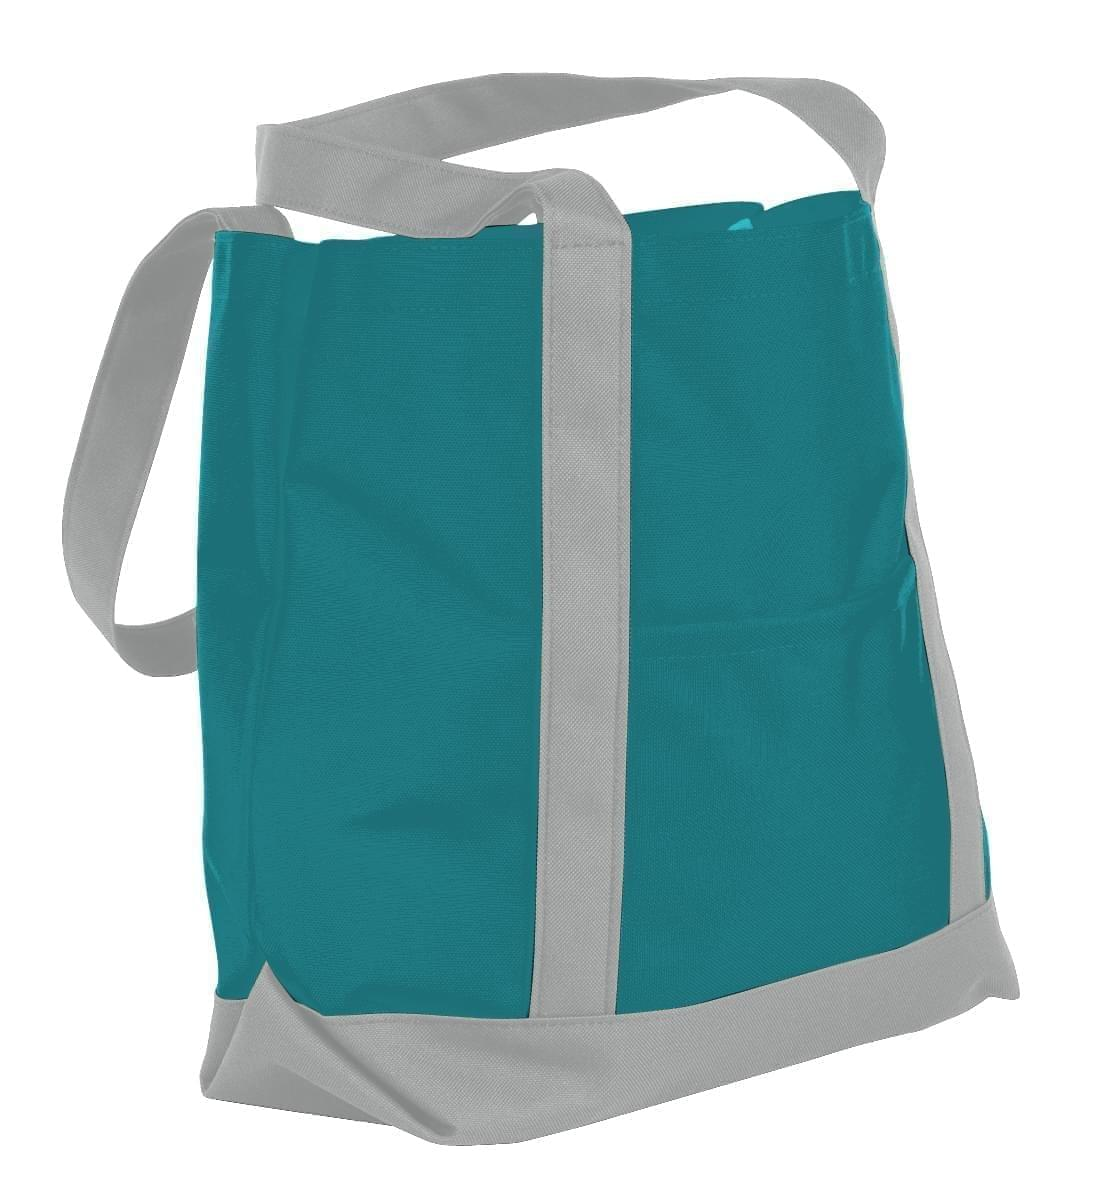 USA Made Nylon Poly Boat Tote Bags, Turquoise-Grey, XAACL1UA9N